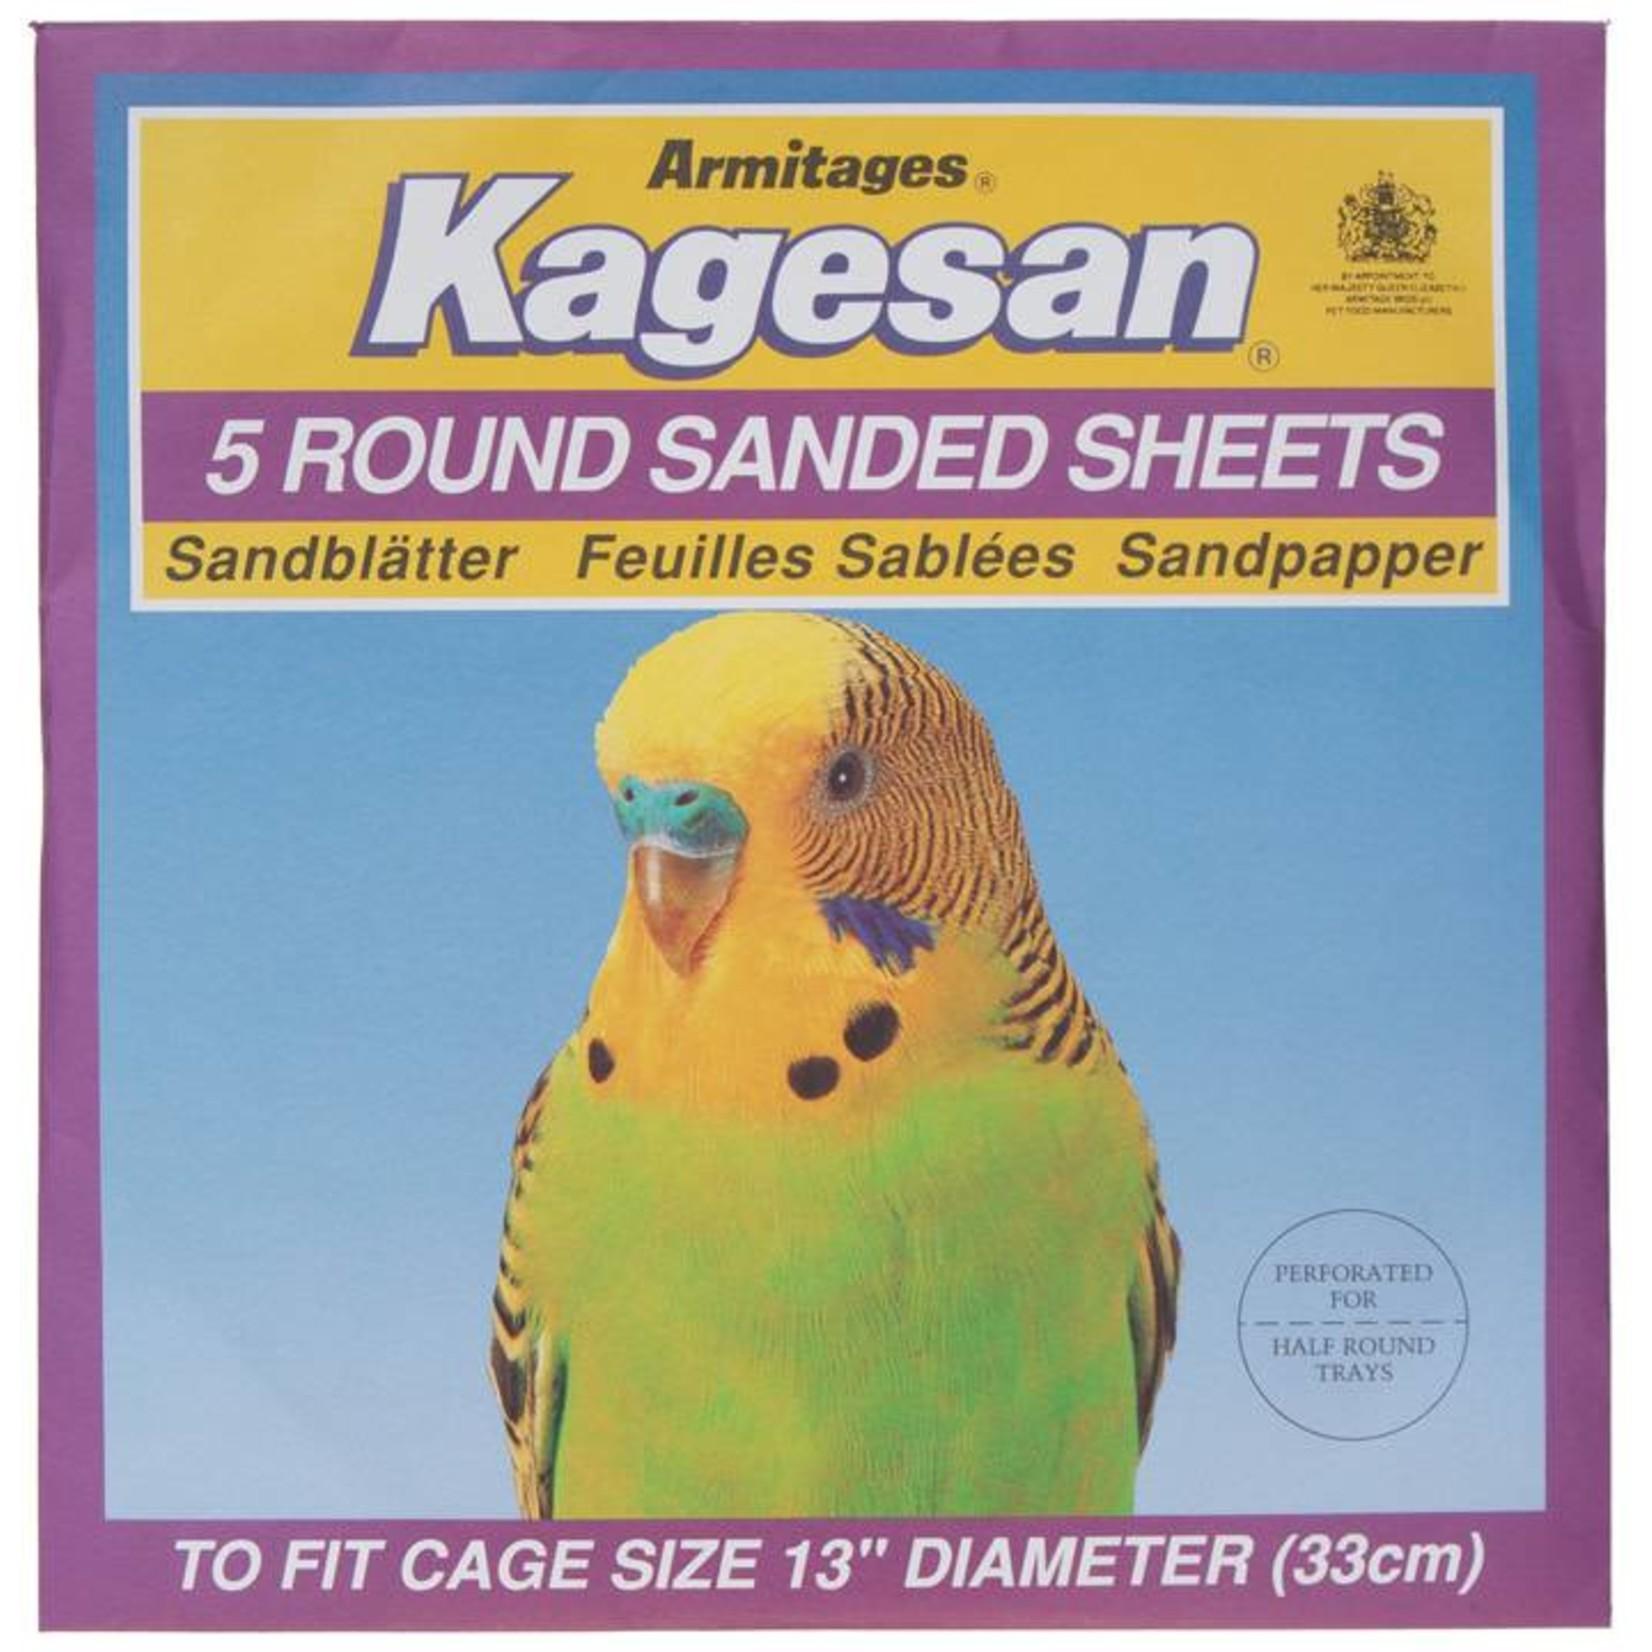 Armitage Kagesan Purple 33cm Diameter Round Bird Cage  Sanded Sheets, 5 pack